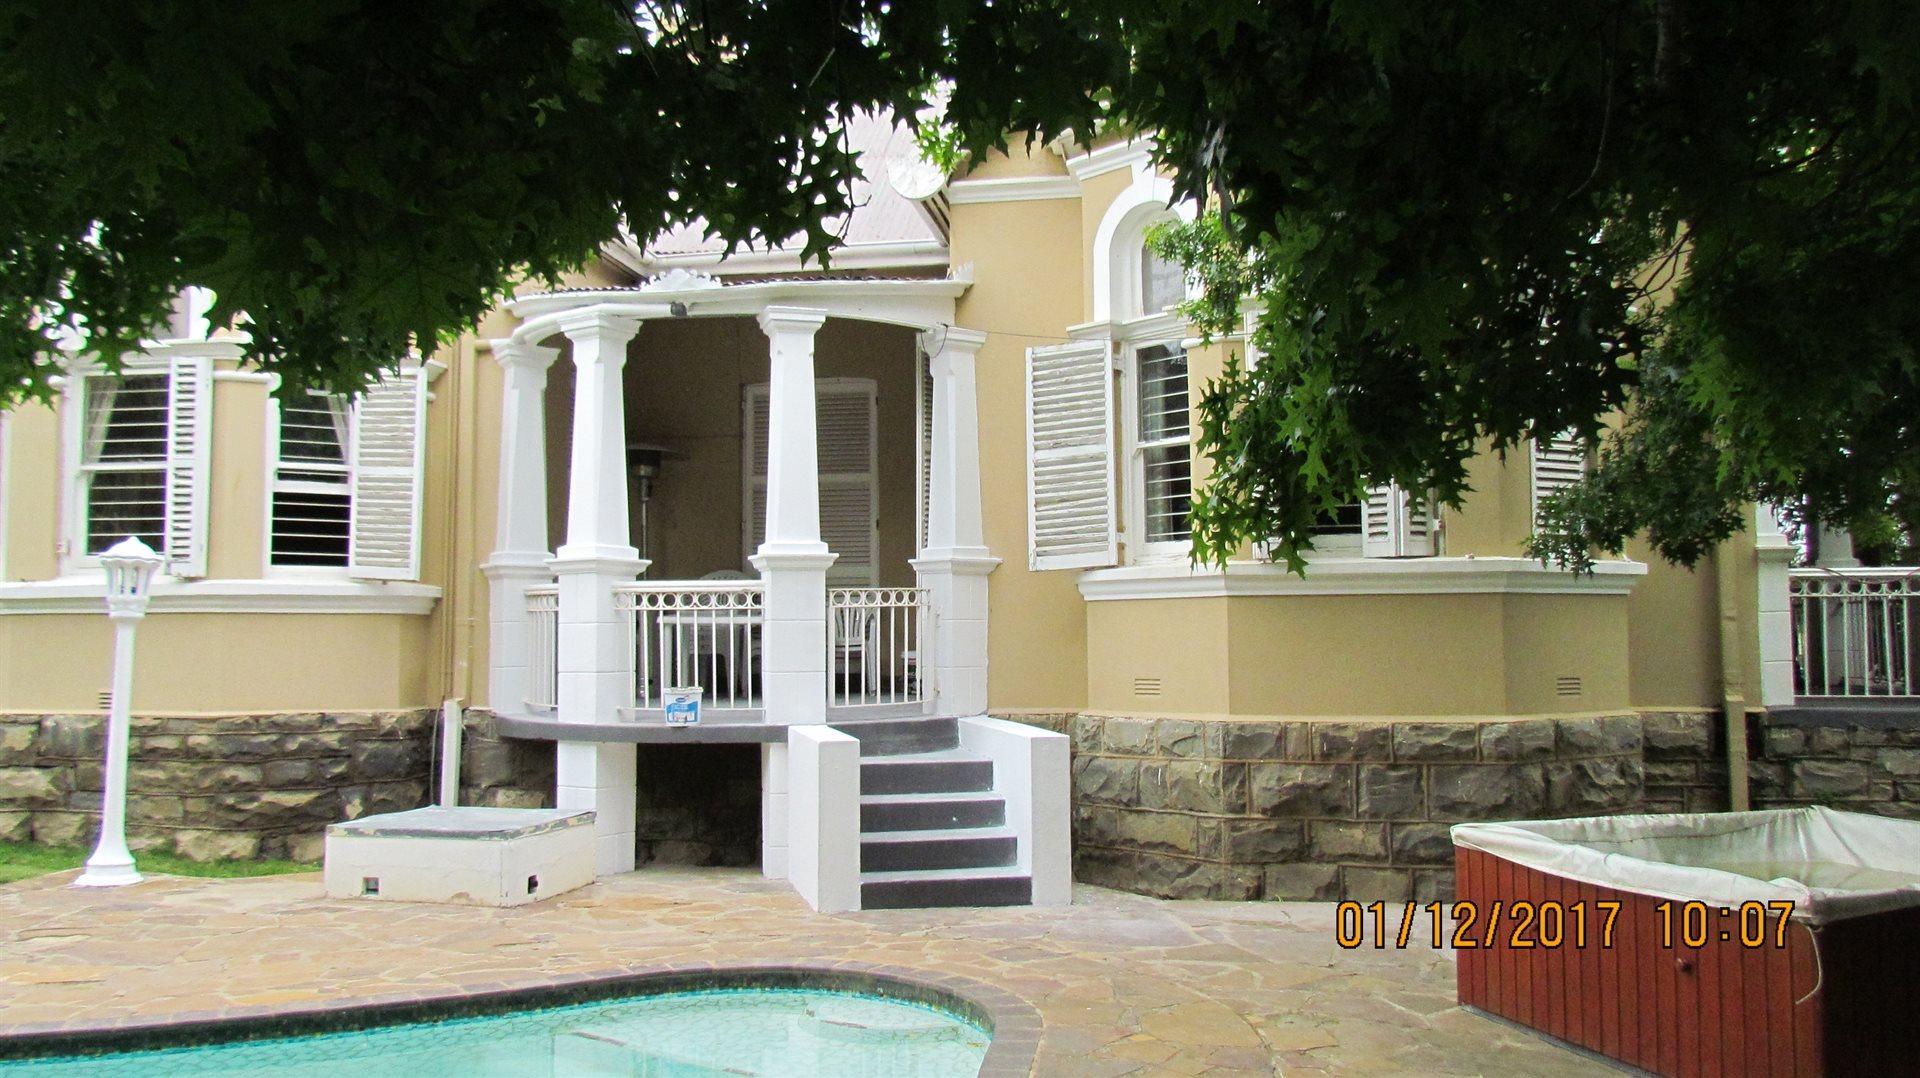 Property for Sale by DLC INC. ATTORNEYS Teresa De La Querra, House, 4 Bedrooms - ZAR 1,600,000